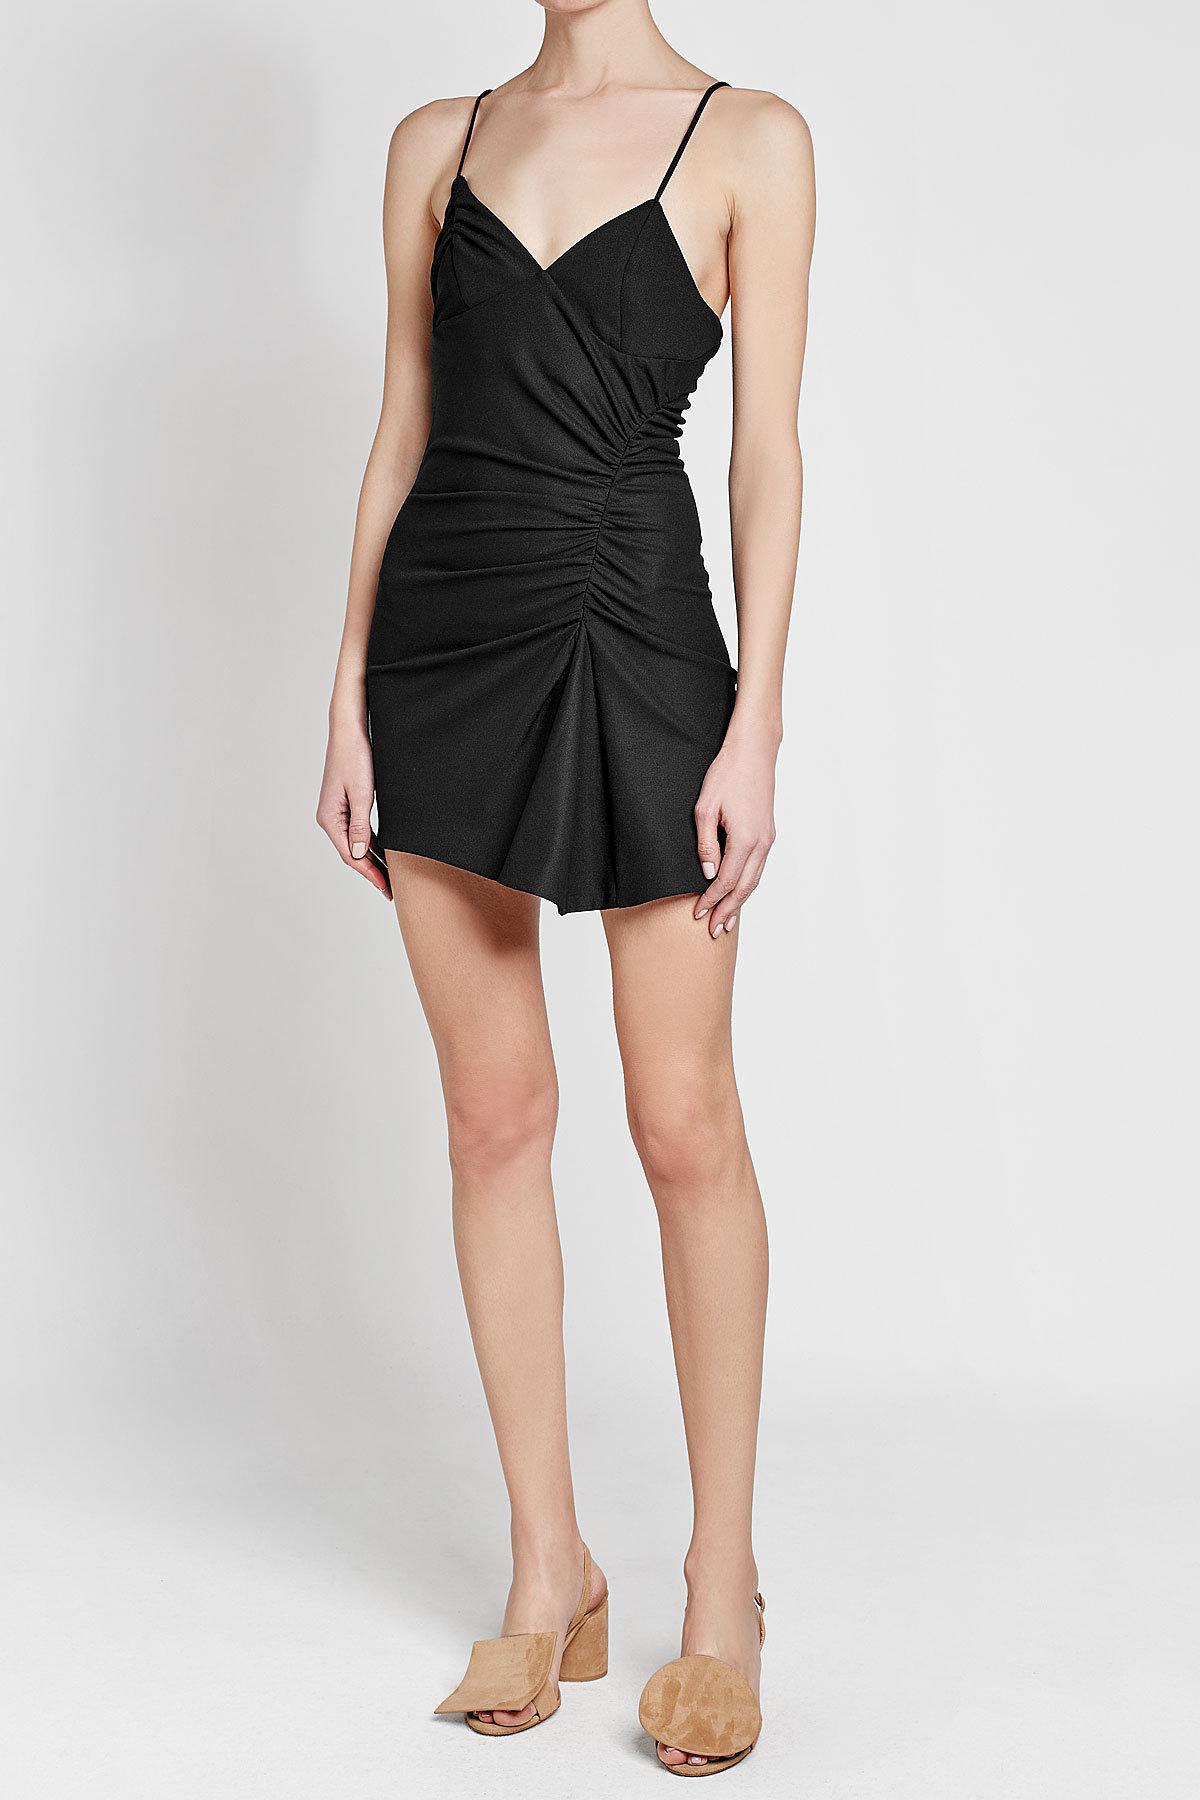 1d497ddb54fa Jacquemus Conga Dress in Black - Lyst